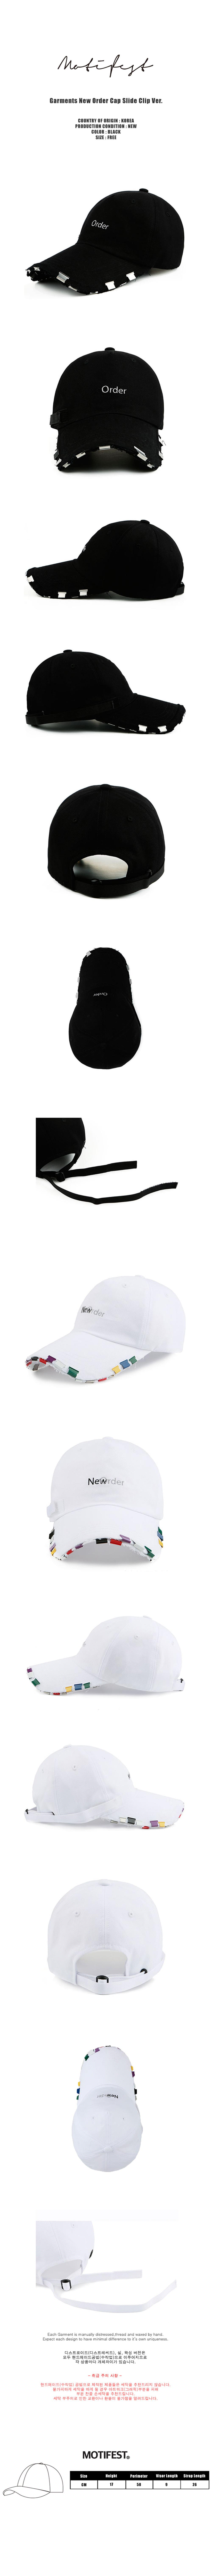 Garments-New-Order-Cap-Slide-Clip-Ver-1+1-D.jpg